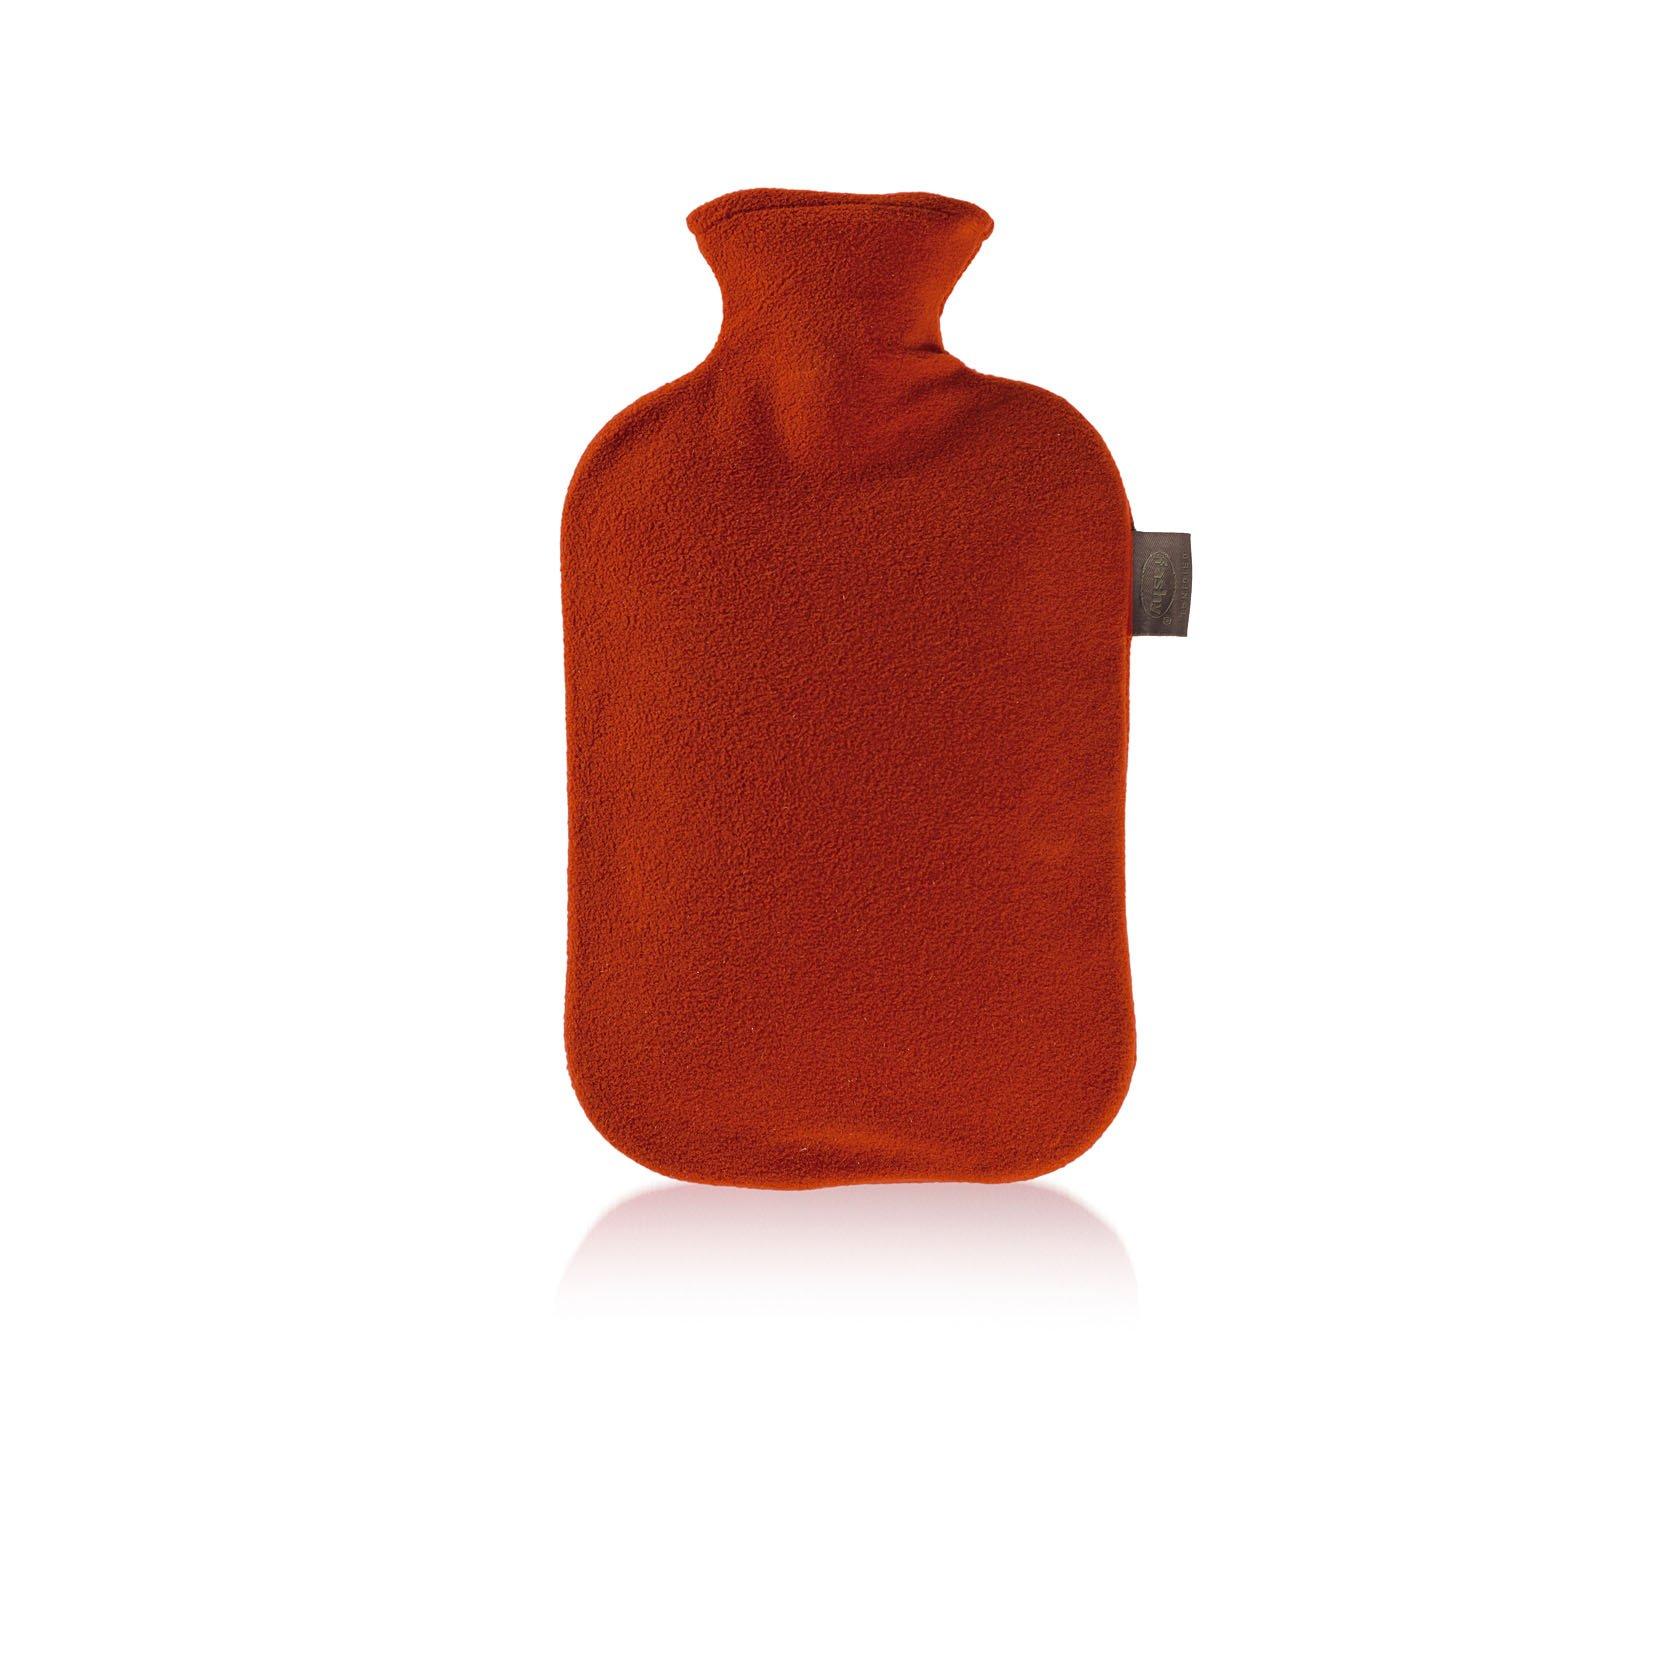 Fashy 6530 - Bolsa de agua caliente con funda de fieltro, 2 L, color